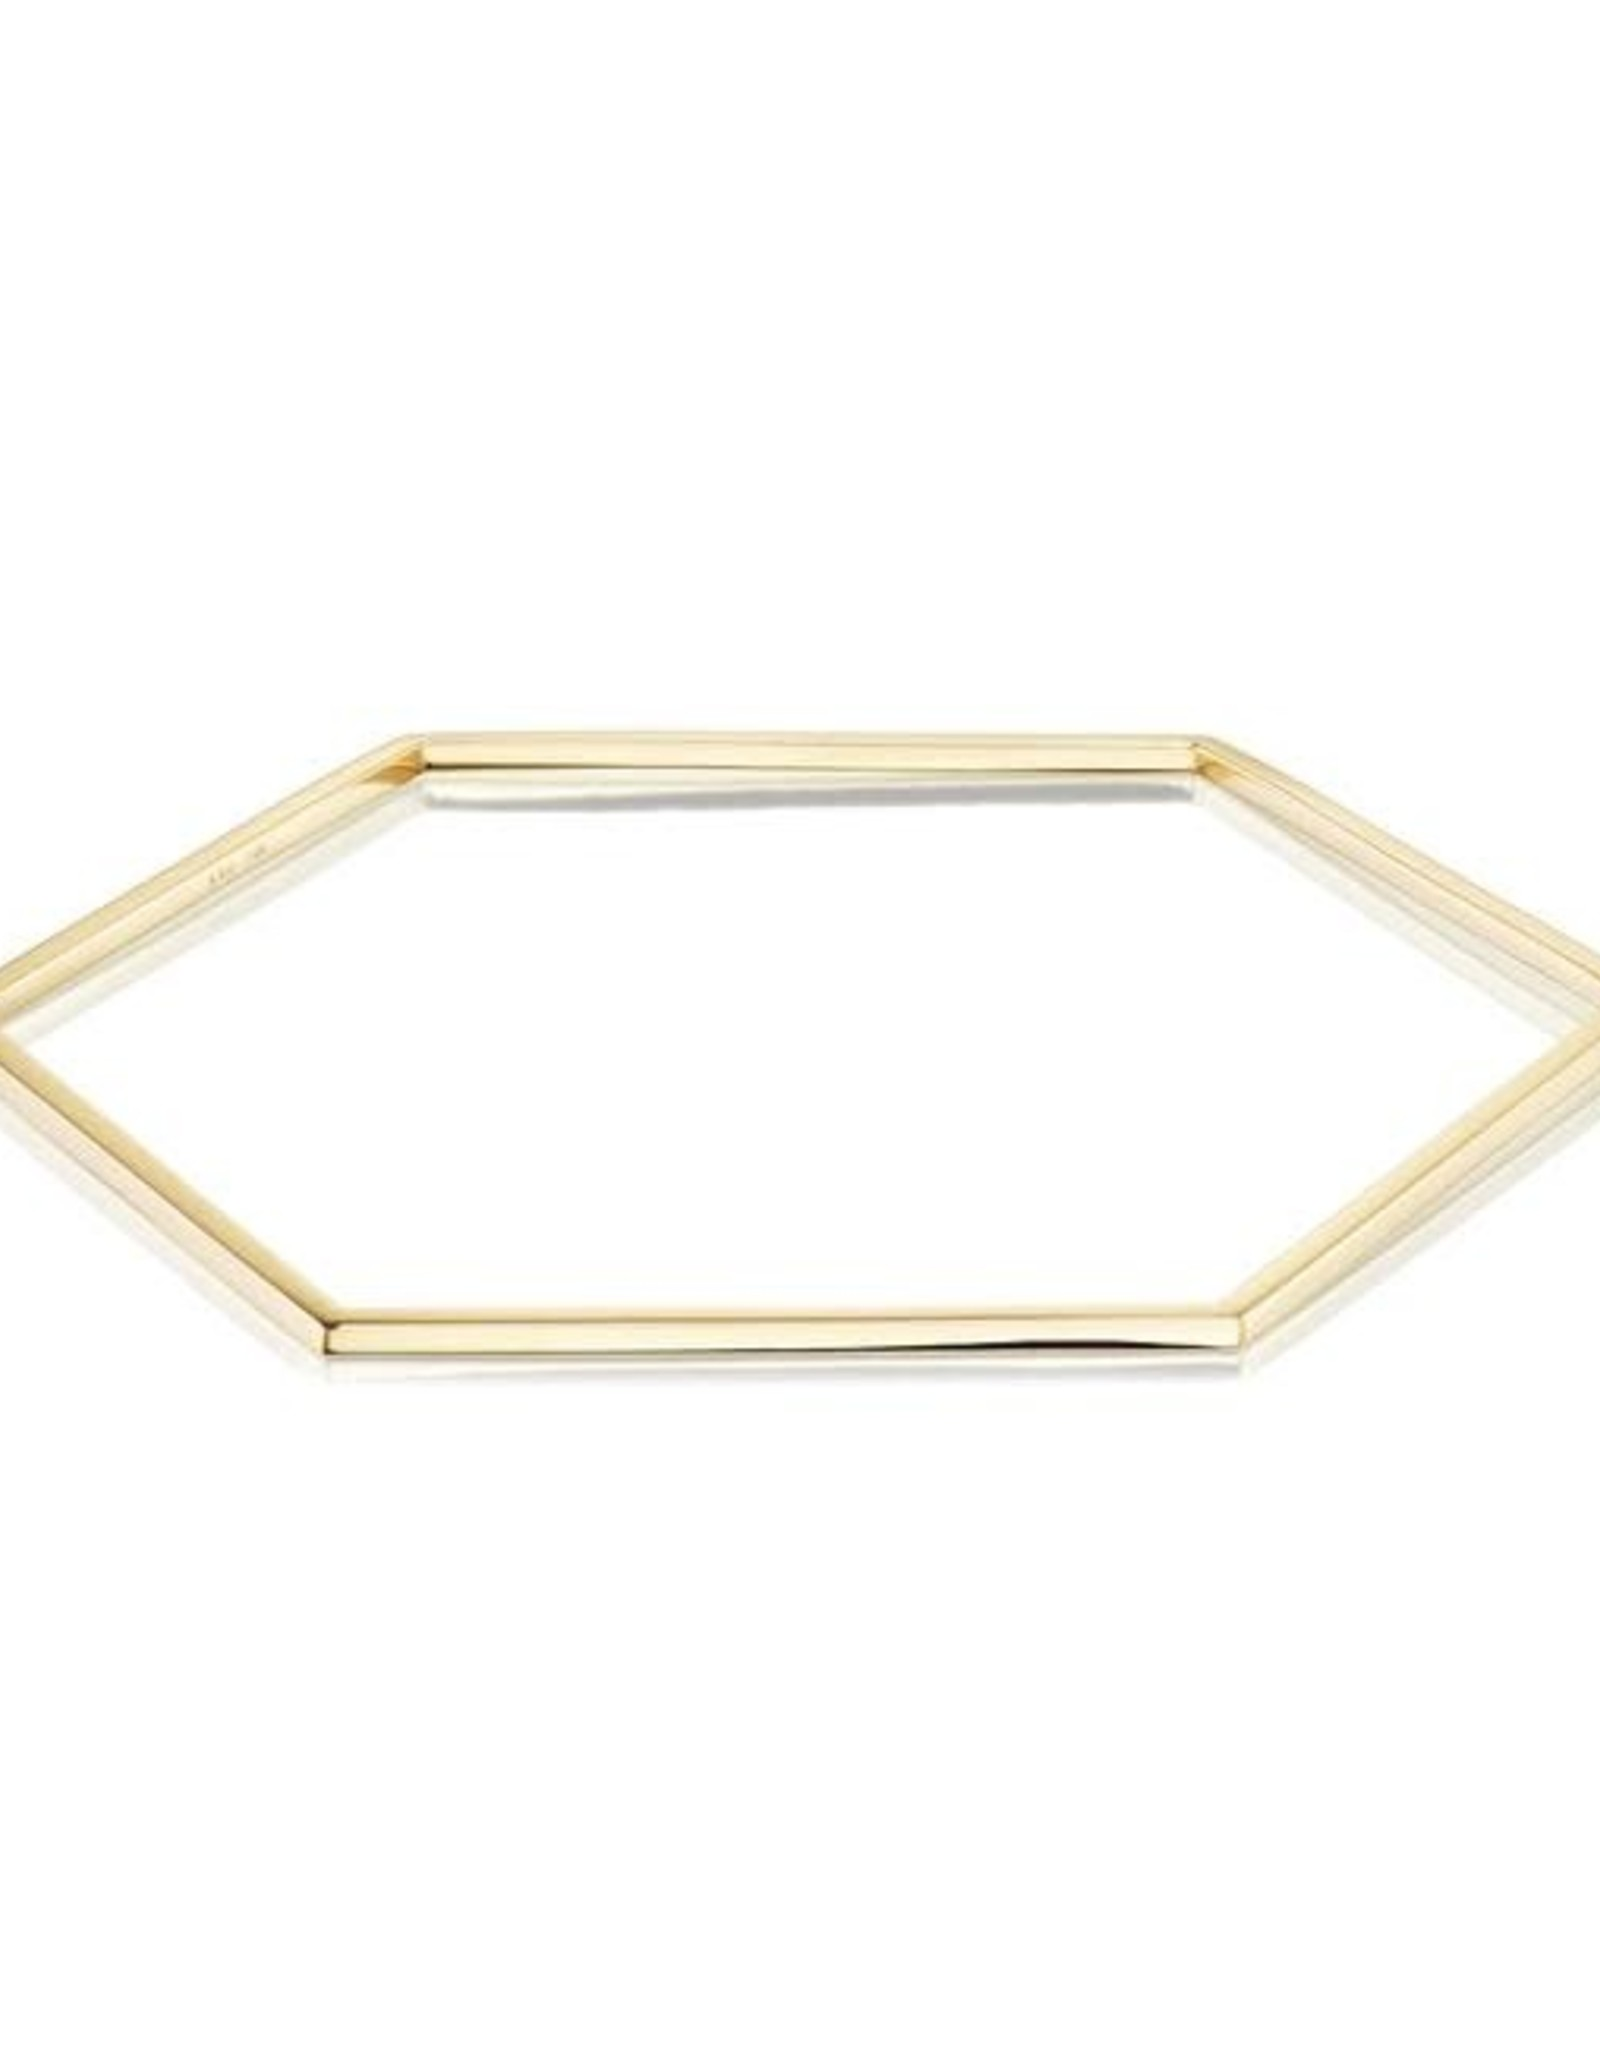 KBH Jewels Reclaimed Gold Hex Bangle